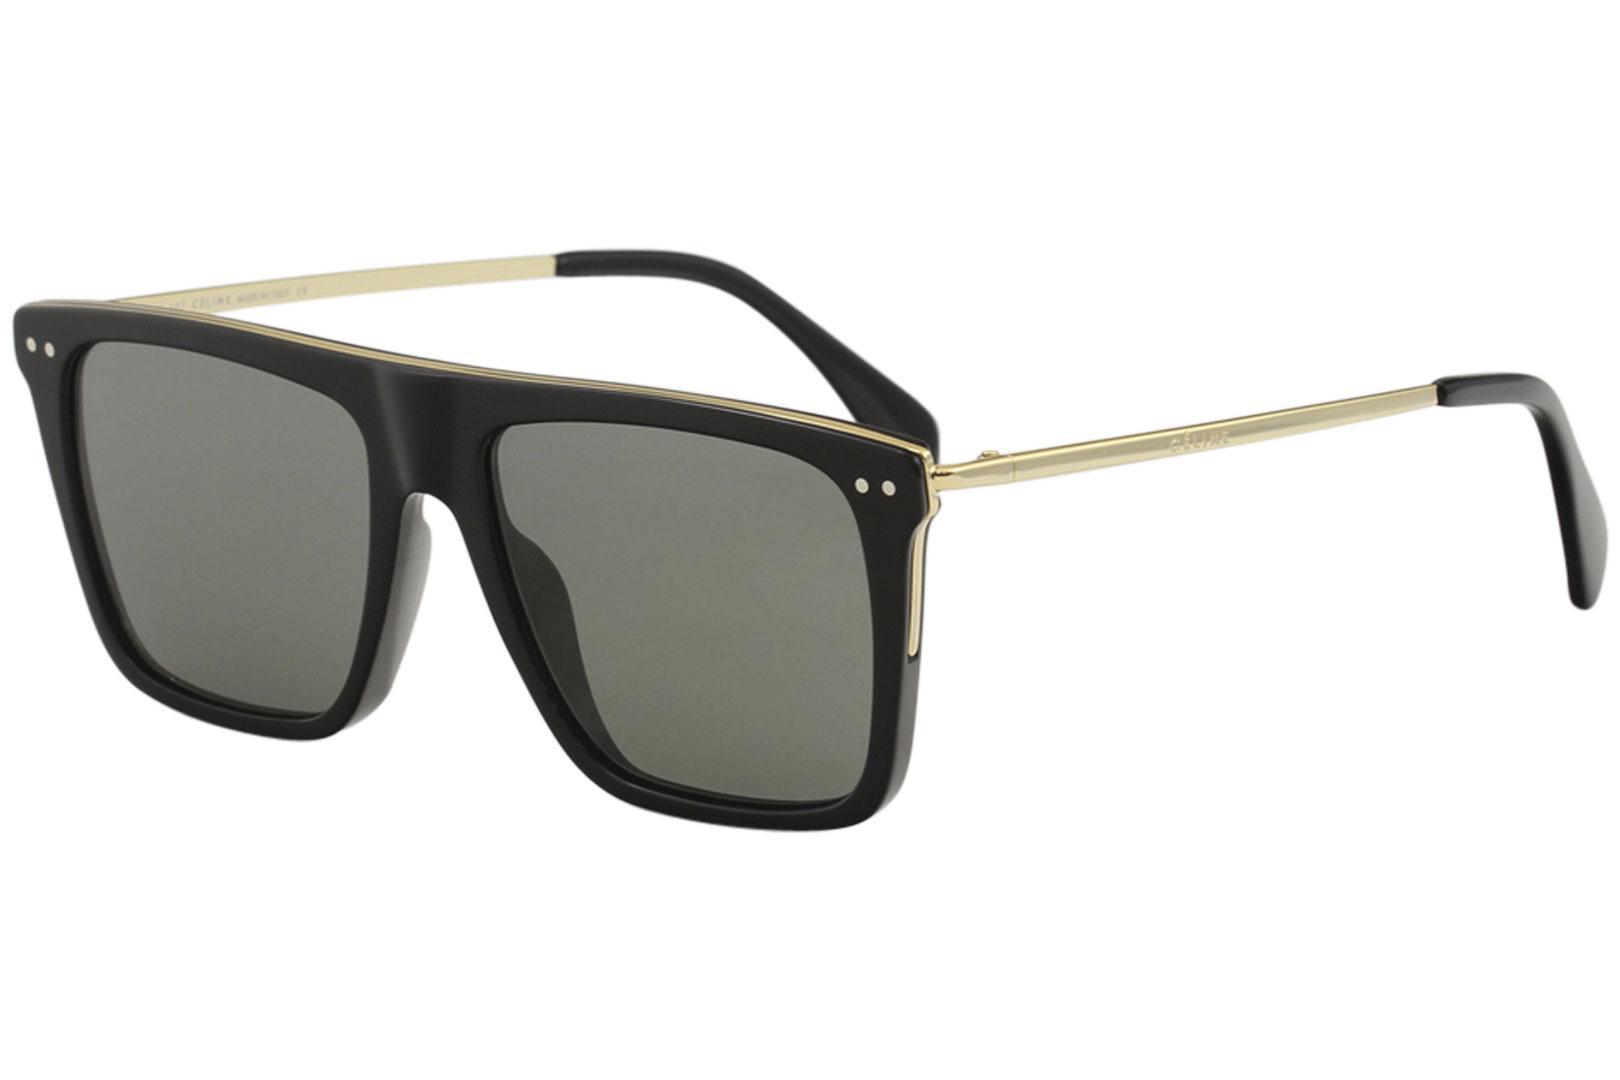 9aa8f0491cca Celine Women's CL40015I CL/40015/I Fashion Square Sunglasses by Celine